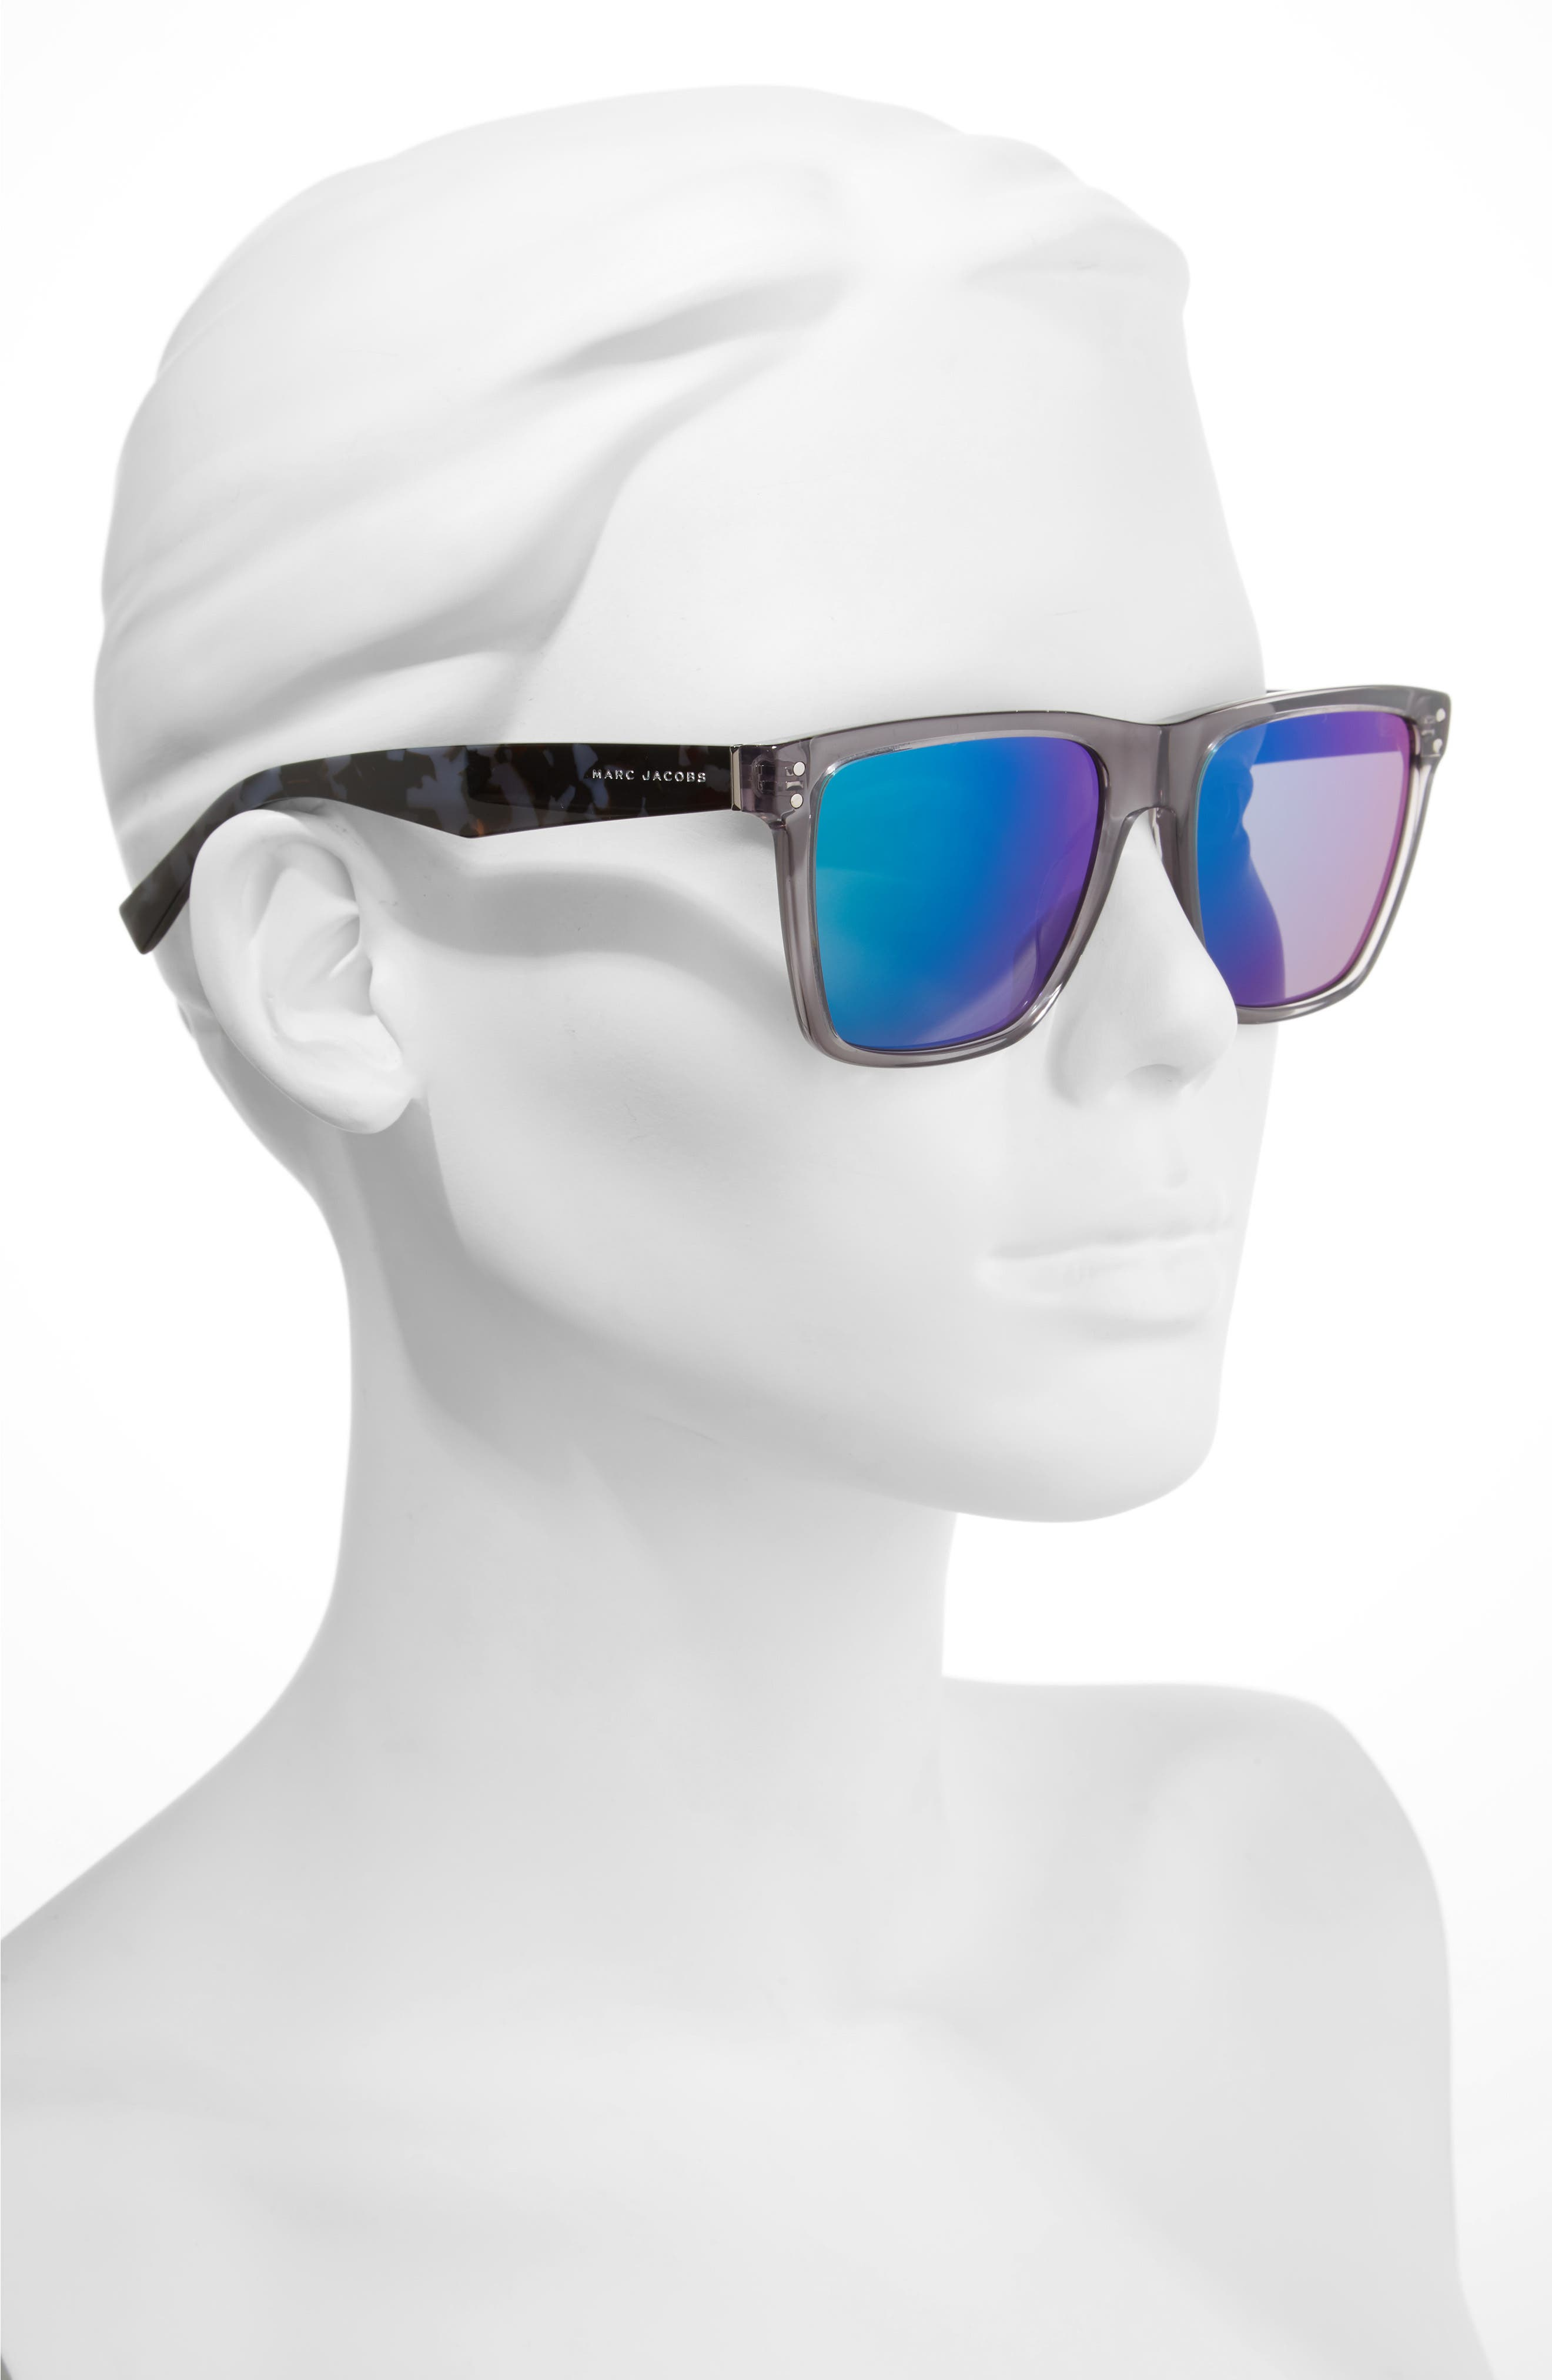 54mm Flat Top Gradient Square Frame Sunglasses,                             Alternate thumbnail 2, color,                             GREY HAVANA